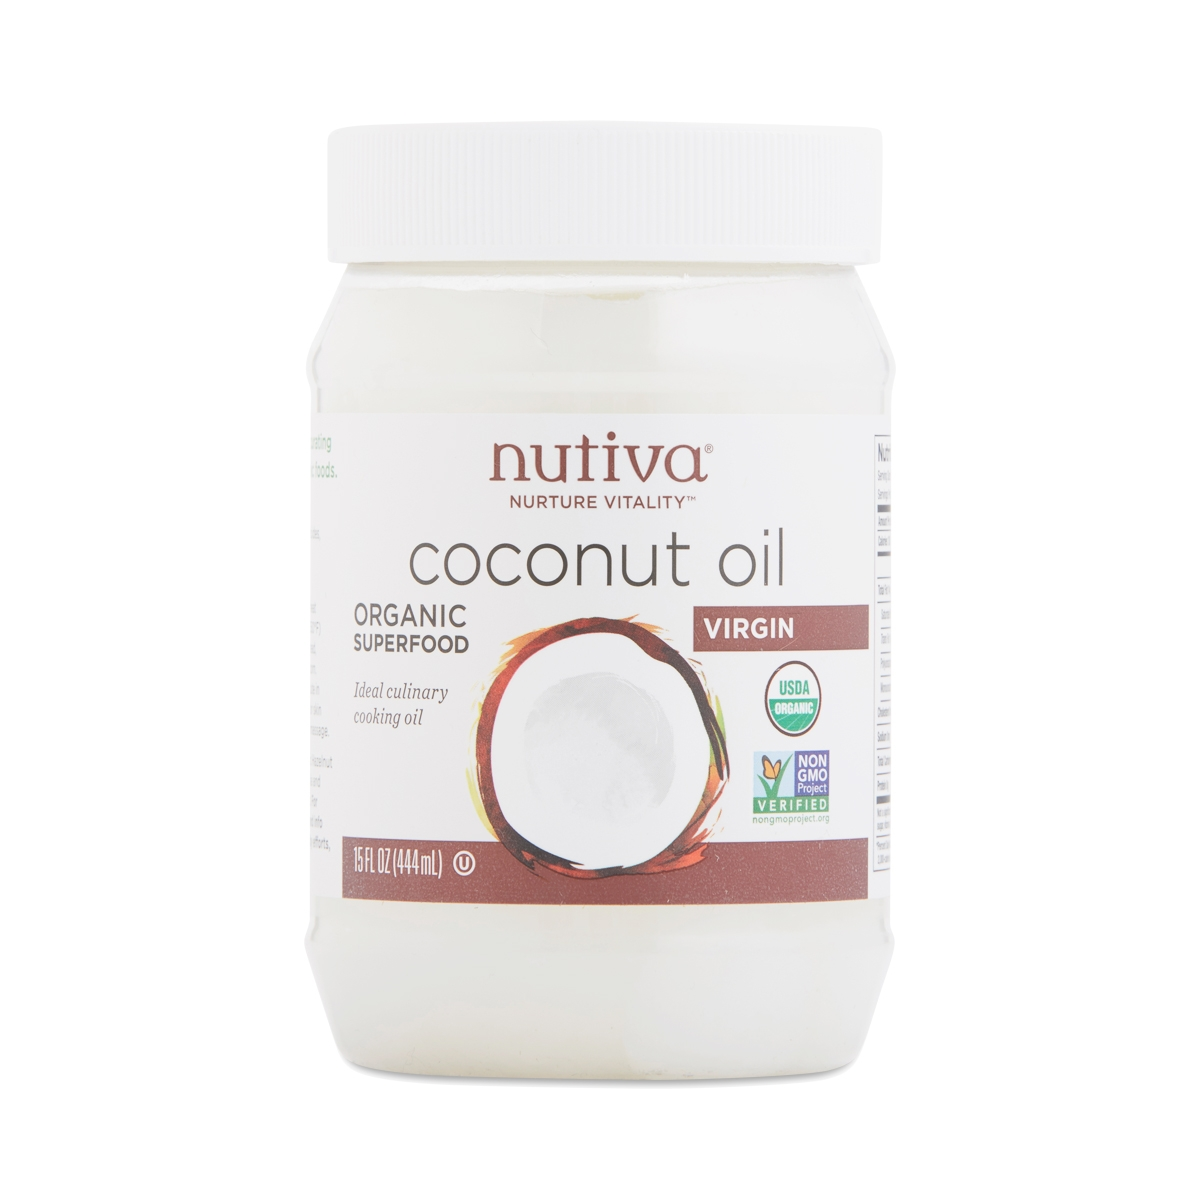 Nutiva Organic Virgin Coconut Oil 15 fl oz jar